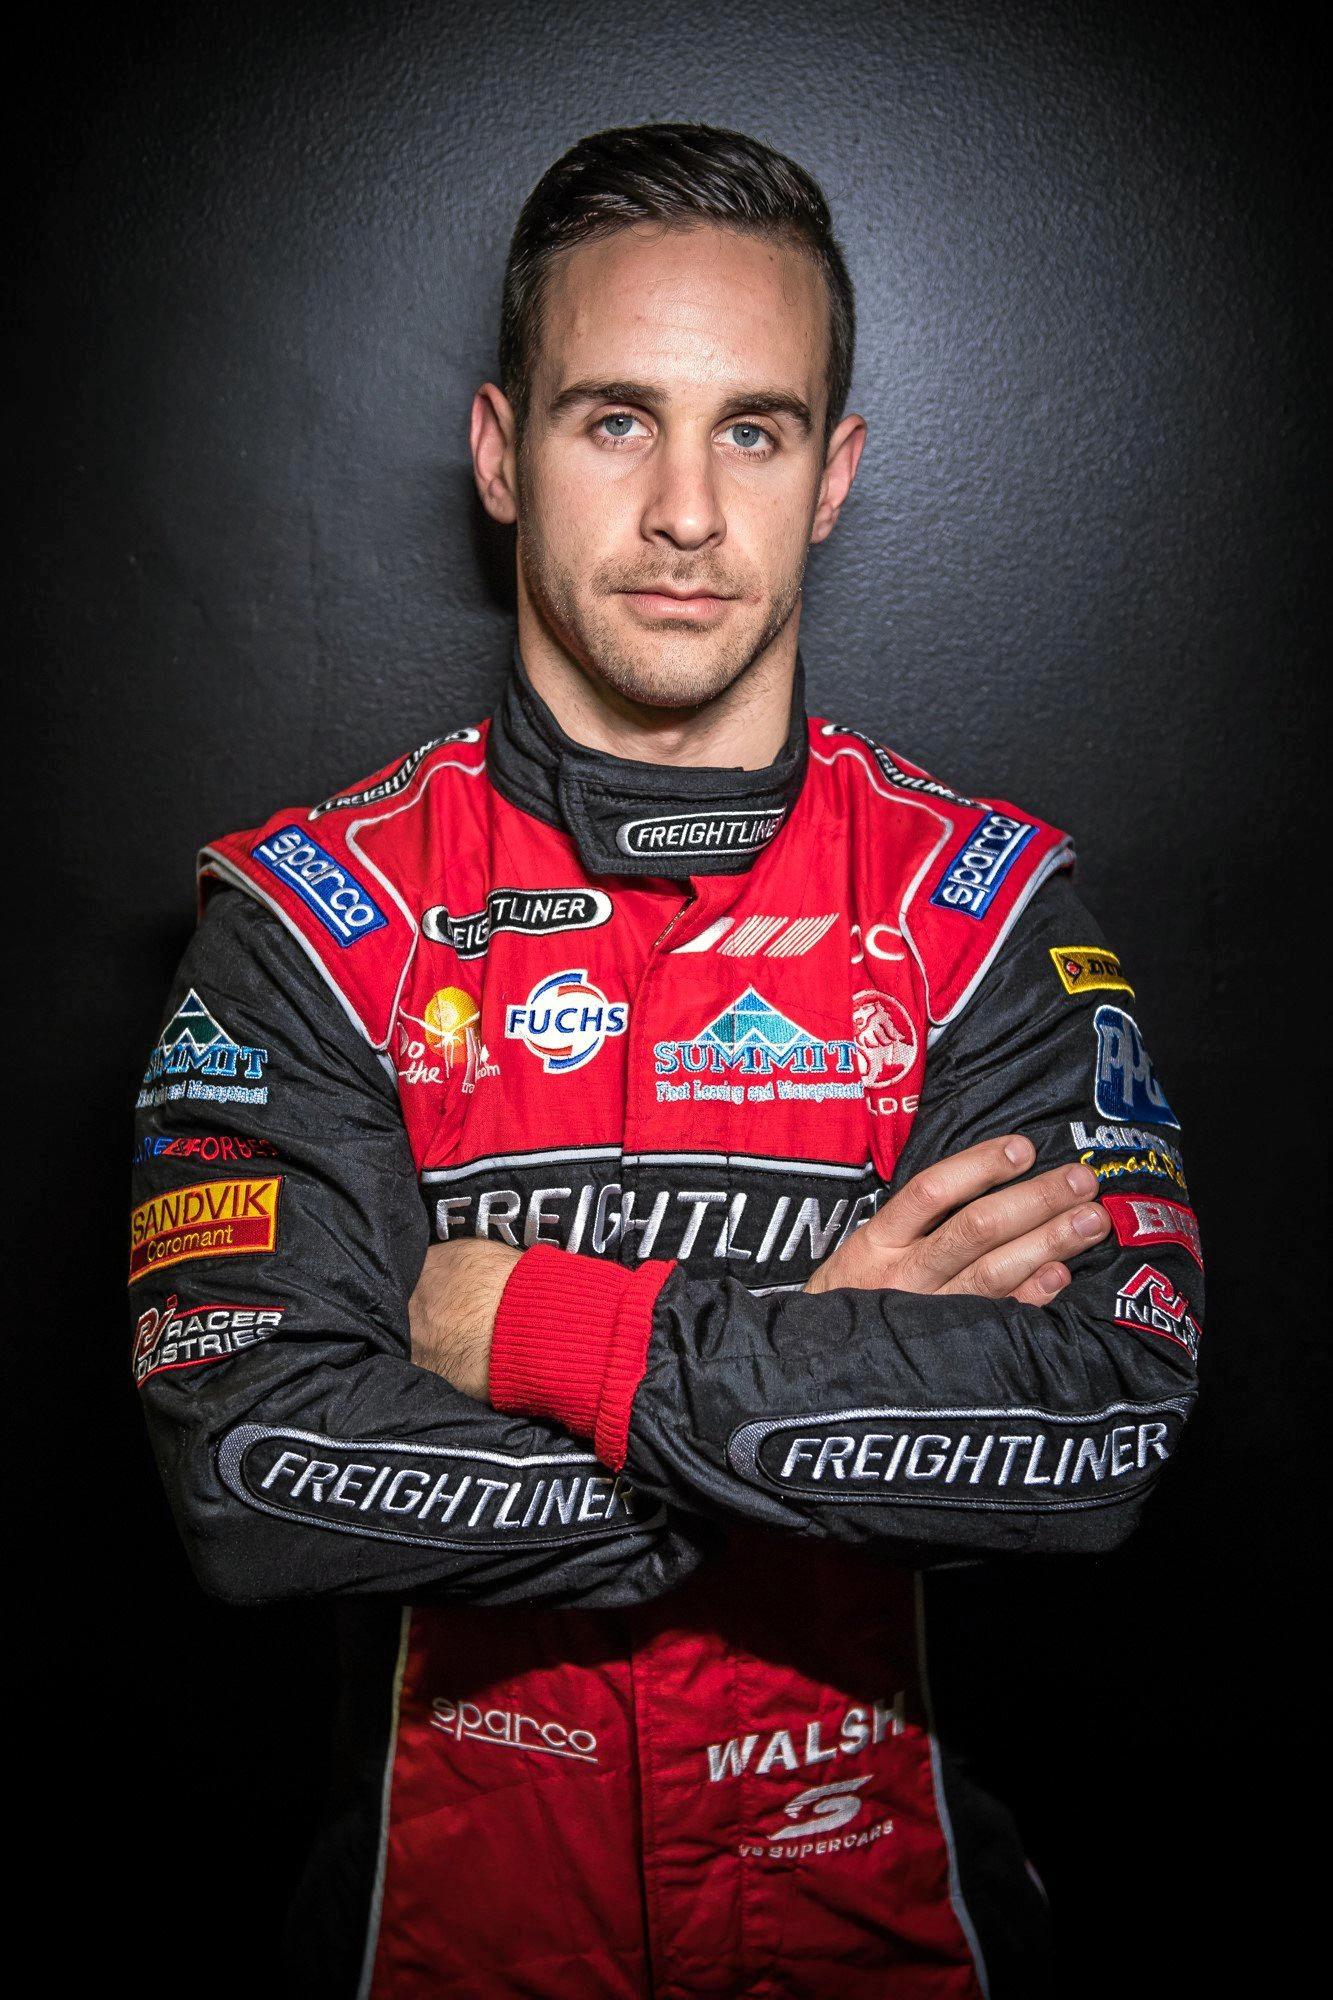 Ipswich racer Ash Walsh.